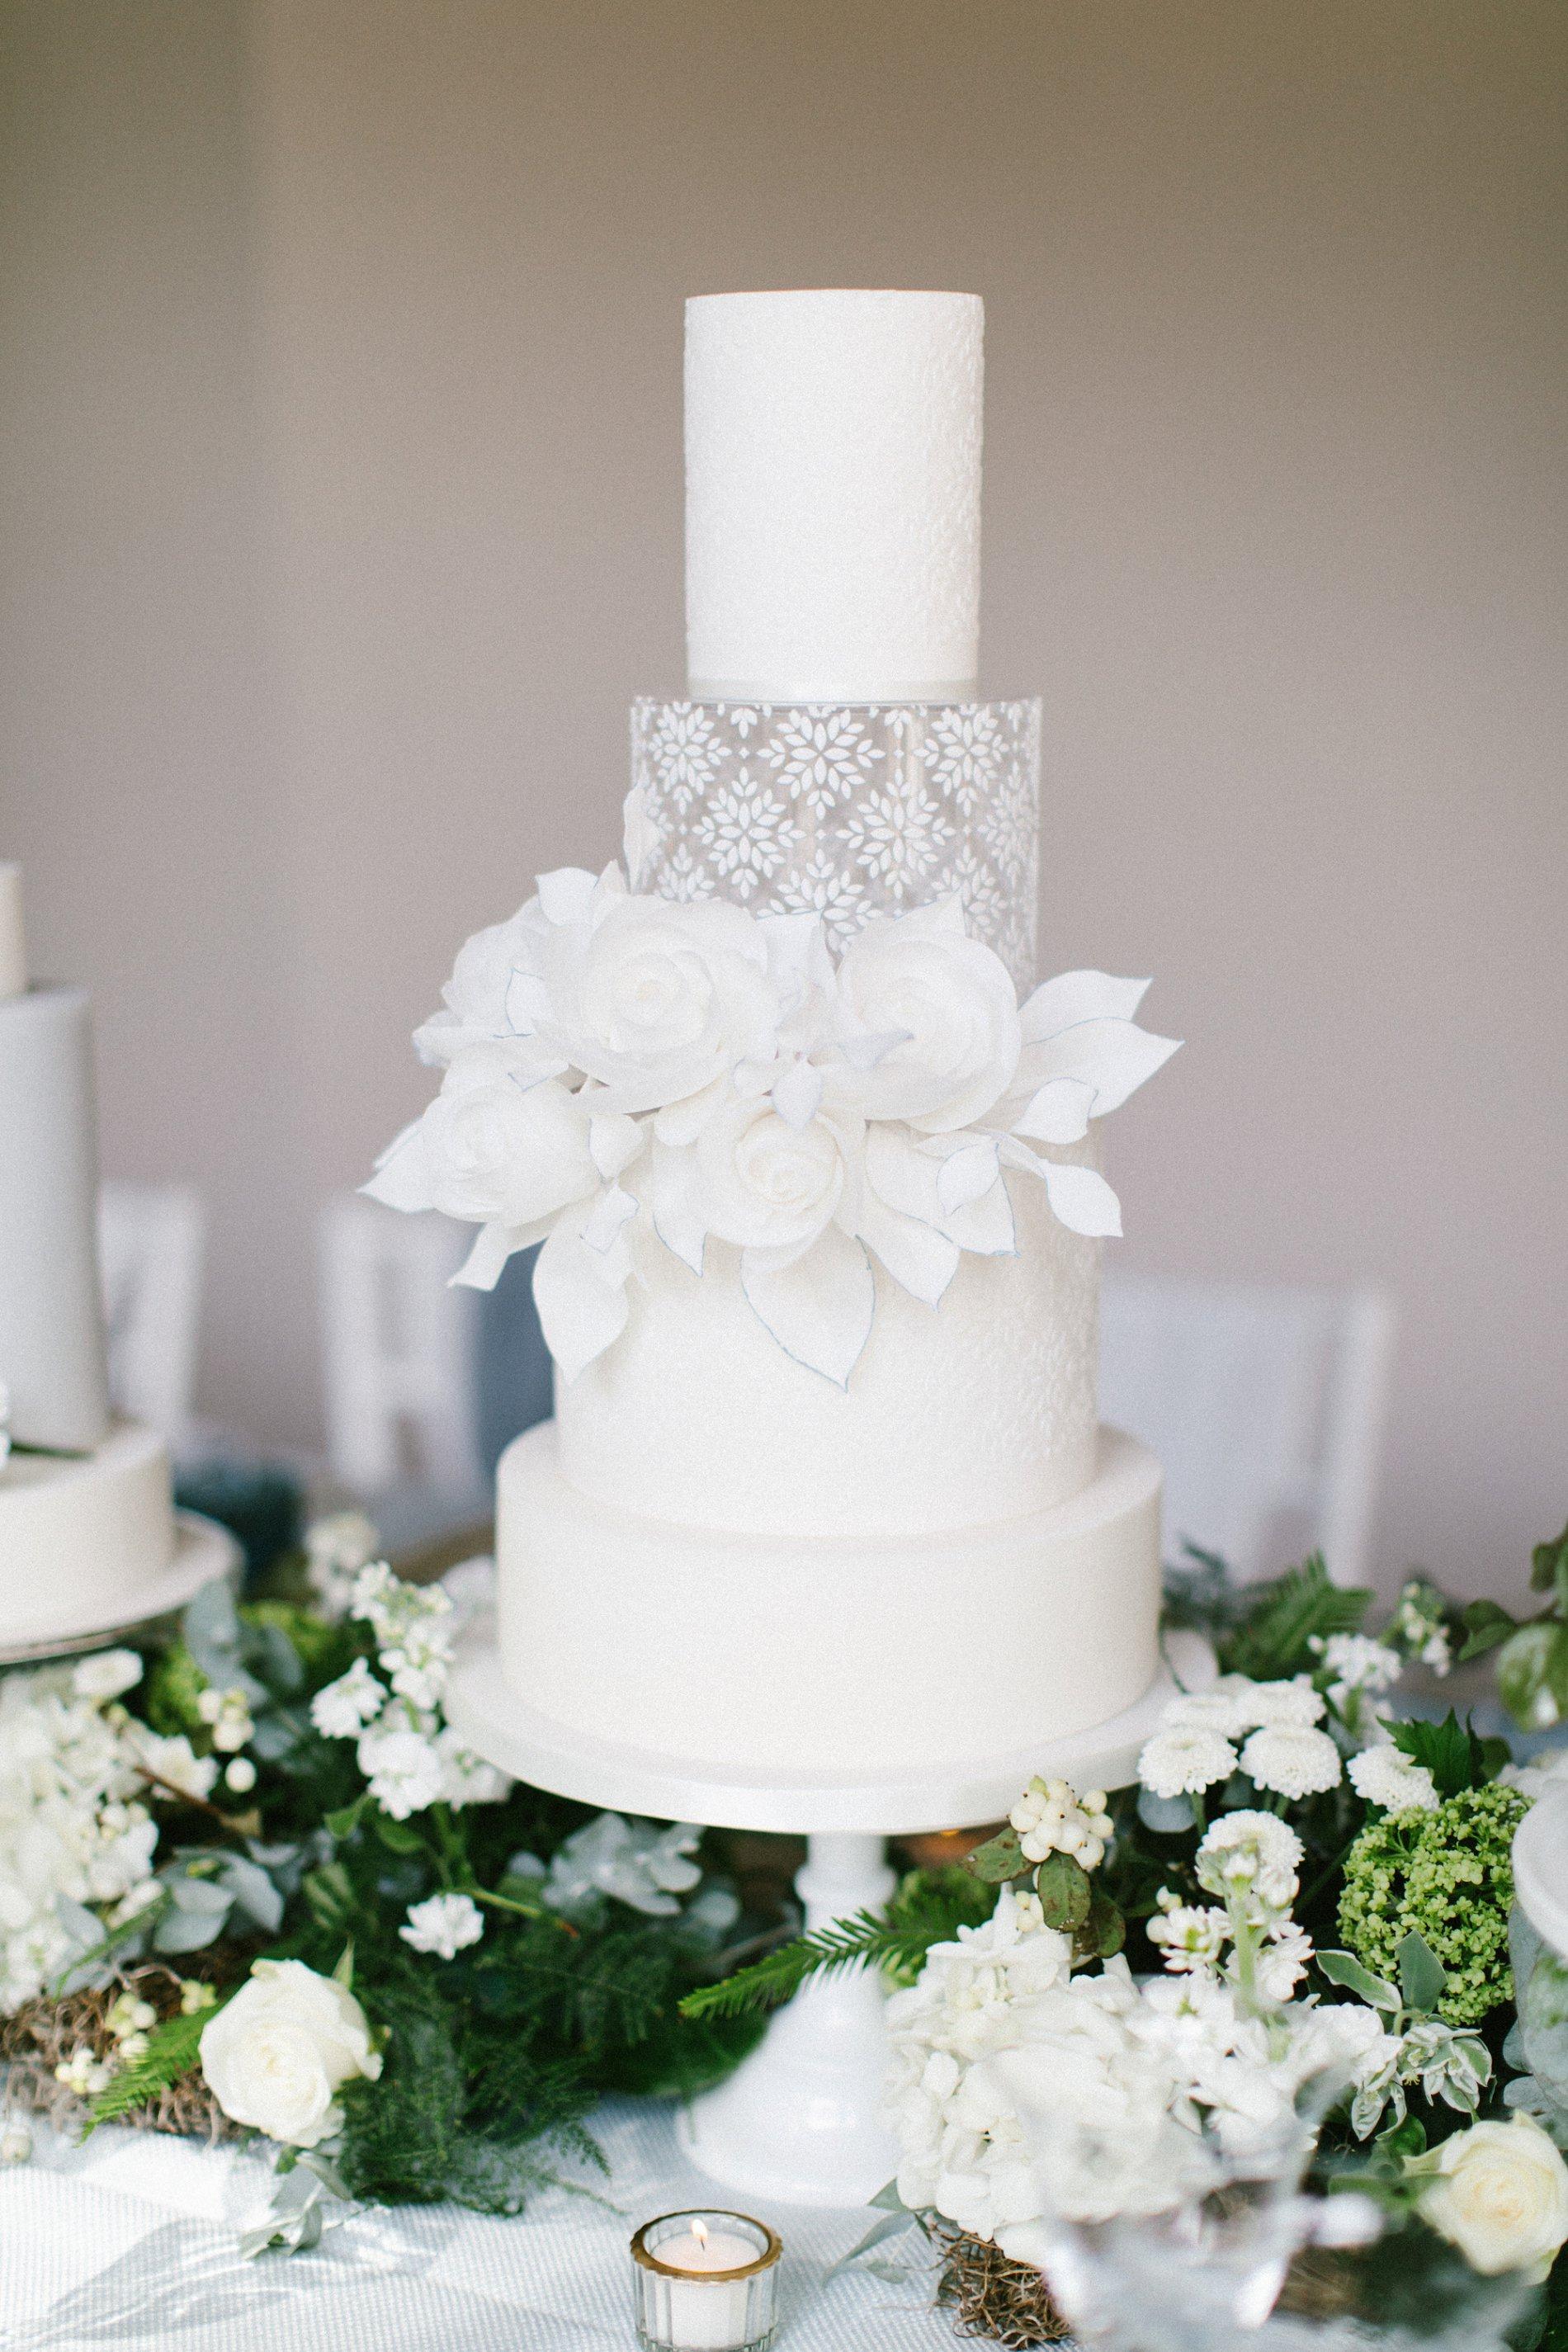 An Intimate Fine Art Wedding Shoot at Newby Hall (c) Melissa Beattie Photography (21)